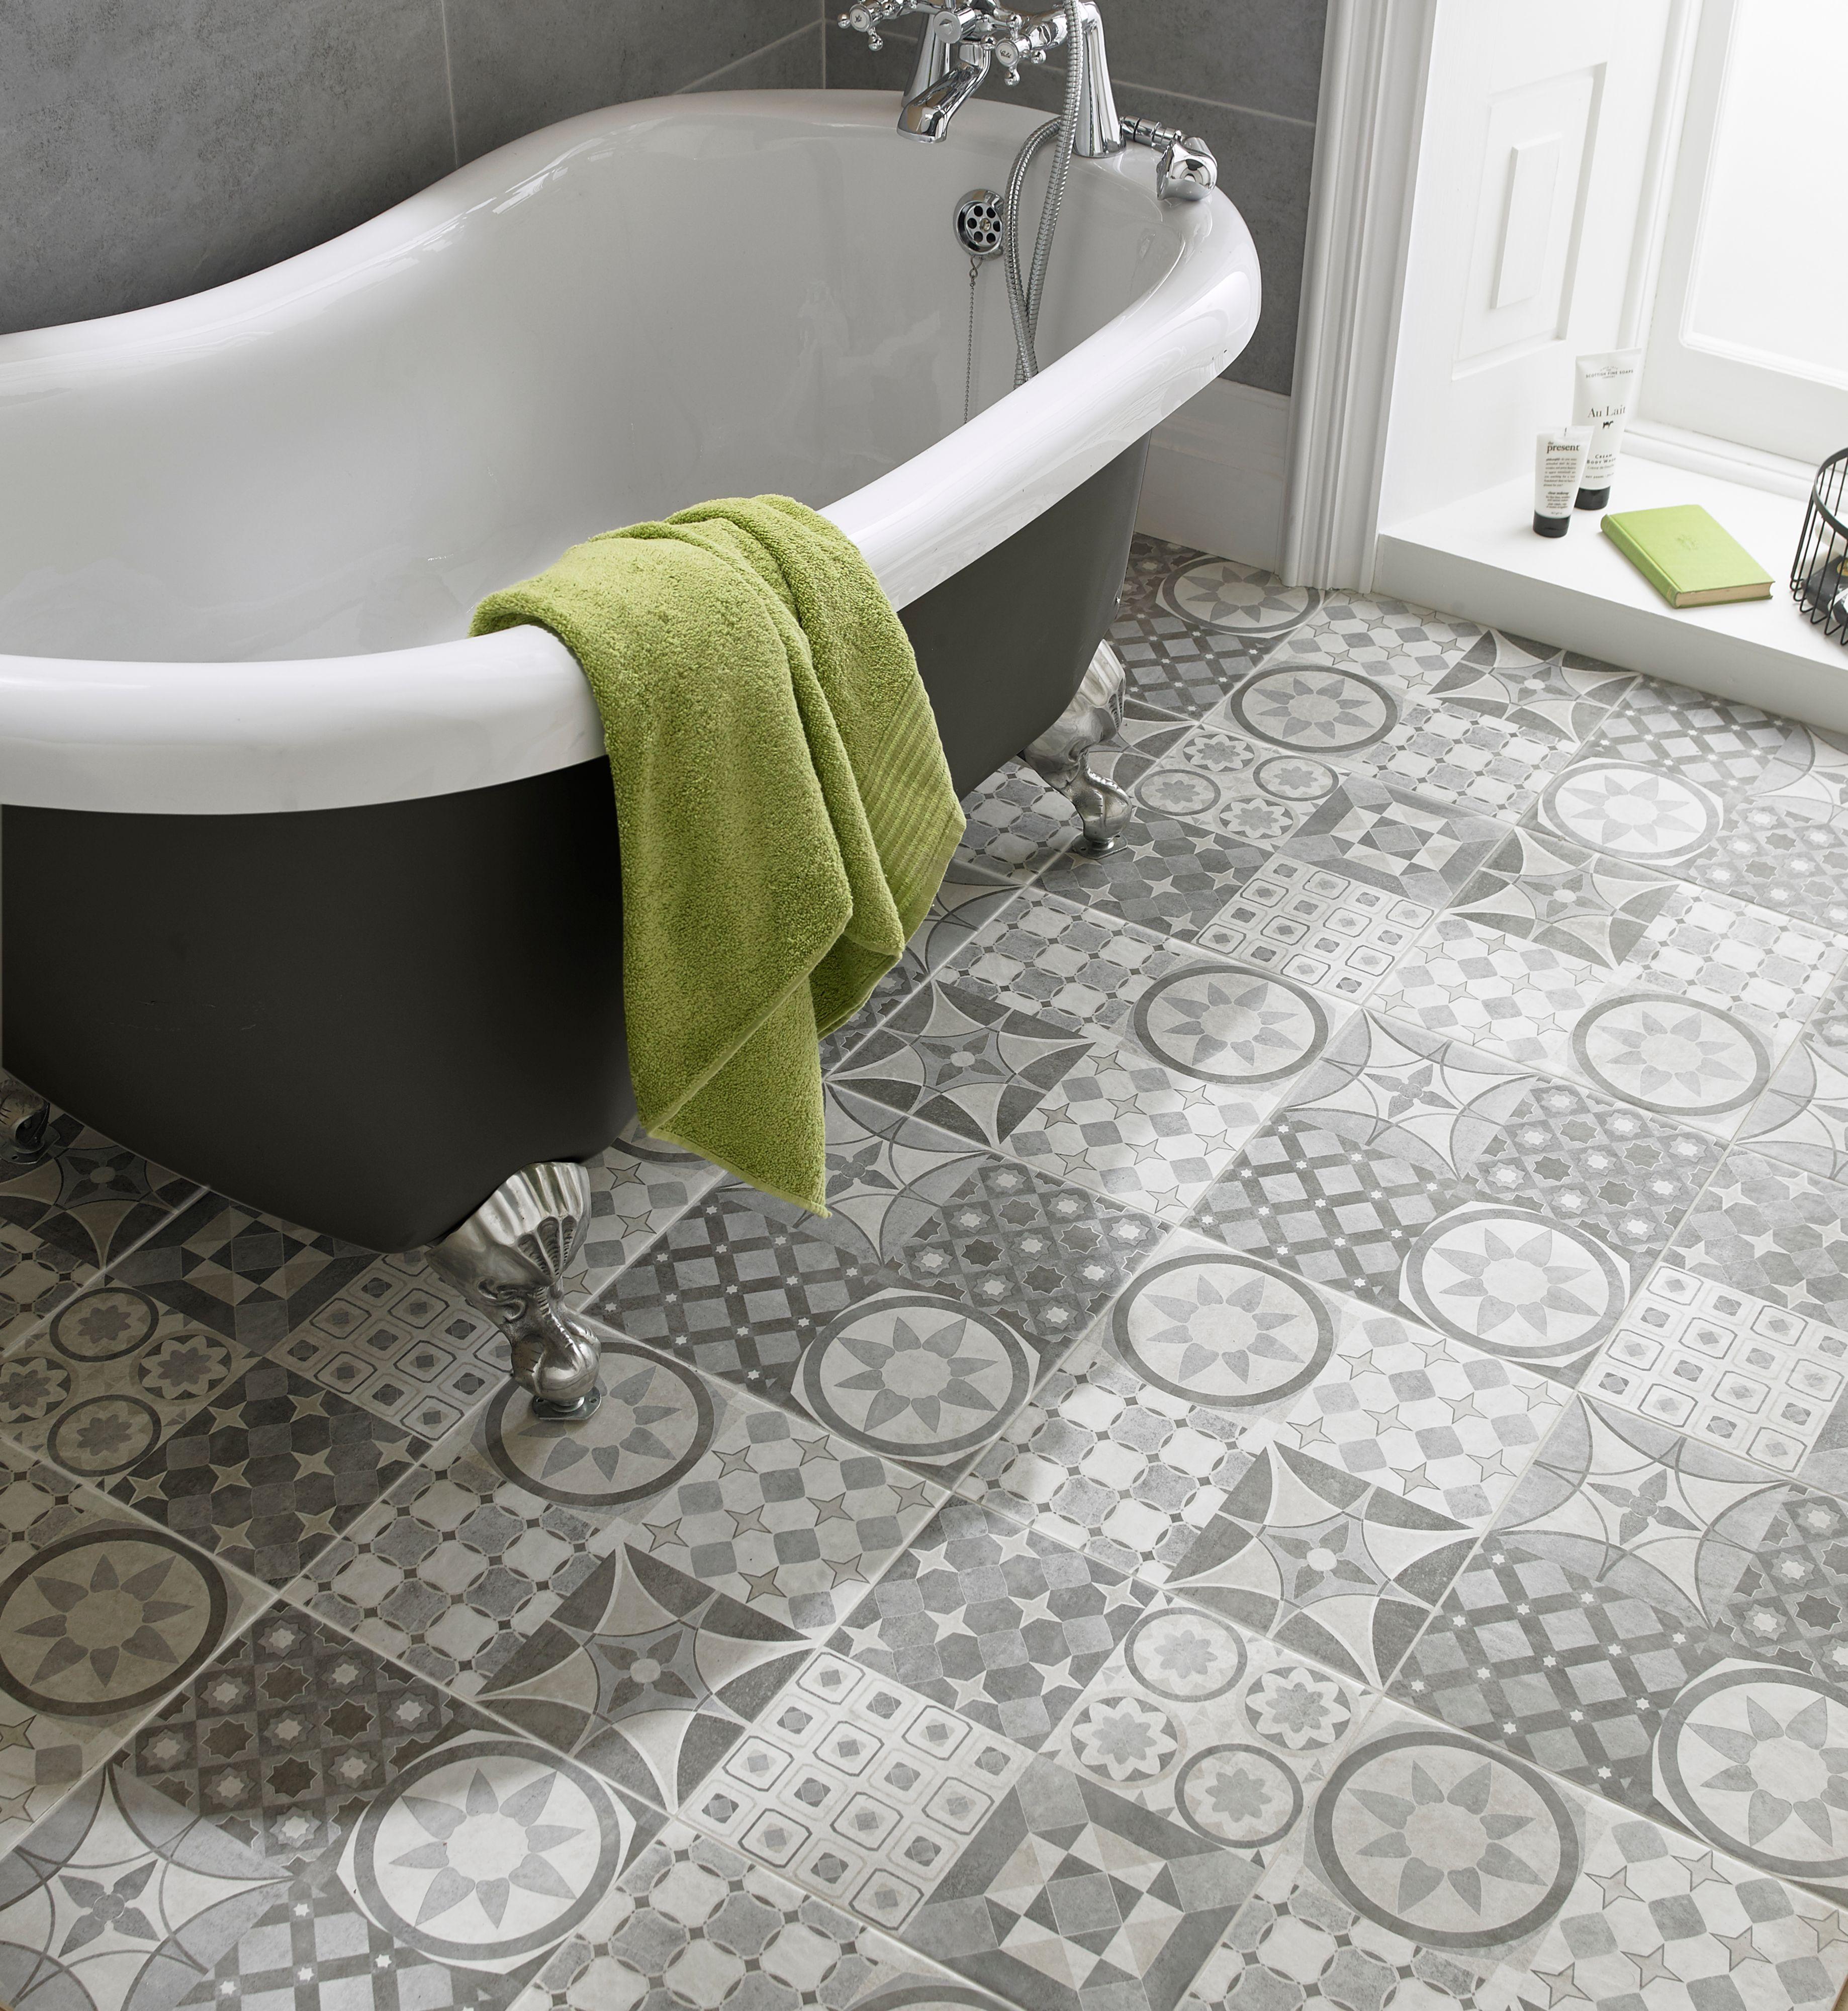 Lofthouse Grey Matt Patchwork Ceramic Wall Floor Sample Tile L 331mm W 331mm B Q For All Your Home A Patchwork Tiles Bathroom Patchwork Tiles Tile Floor